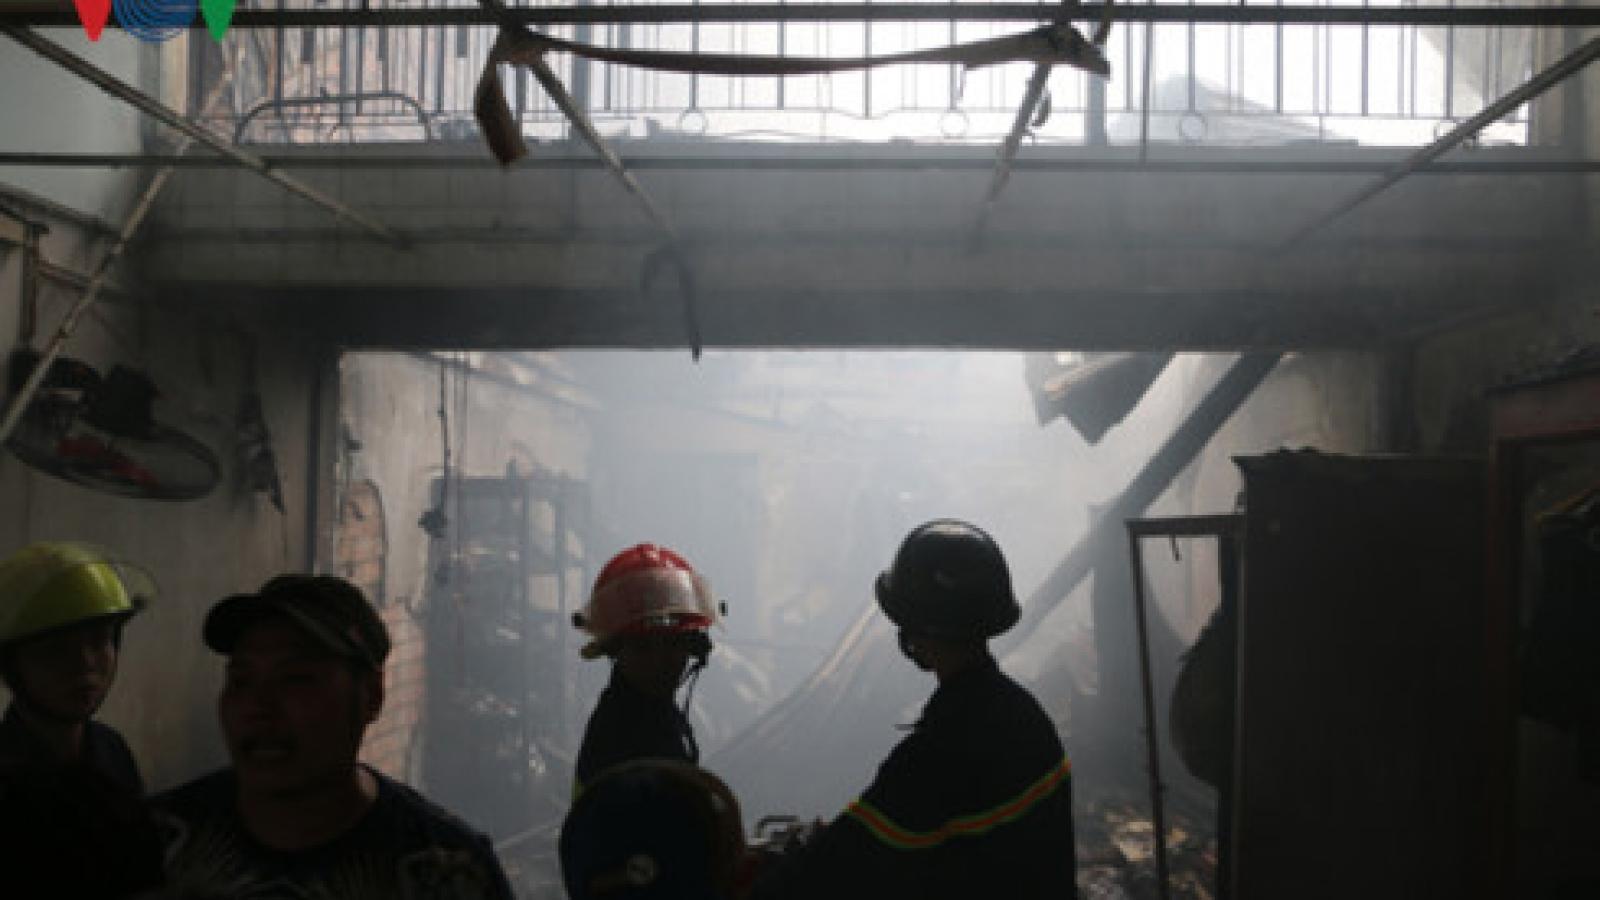 Fire tears through southern Vietnam city, destroys 3 homes